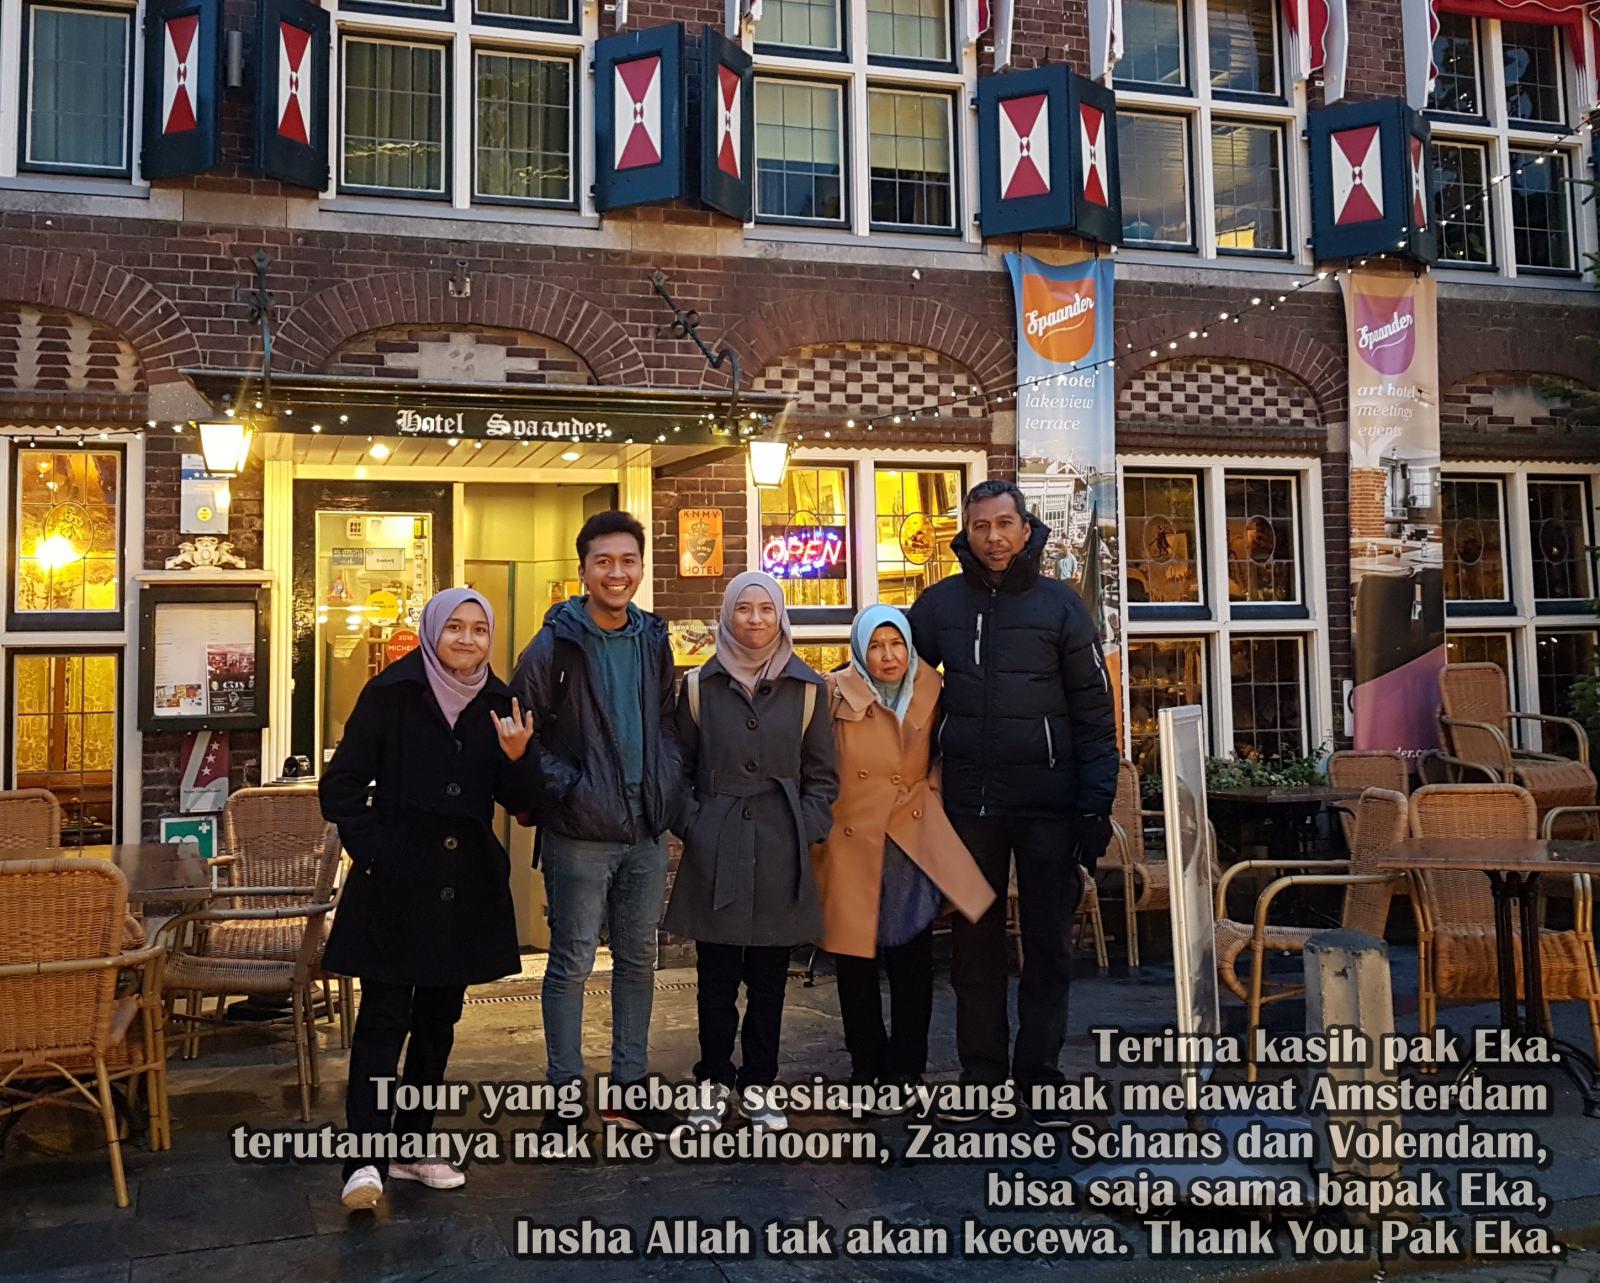 Testimoni Tentang Serbalanda: Terima Kasih Pak Eka. Tour yang hebat, sesiapa yang nak melawat Amsterdam terutama nak ke Giethoorn, Zaanse Schans dan Volendam, bisa saja sama bapak Eka. Insya Allah tak akan kecewa. Pelancung Malaysia, Pusing-Pusing di Belanda